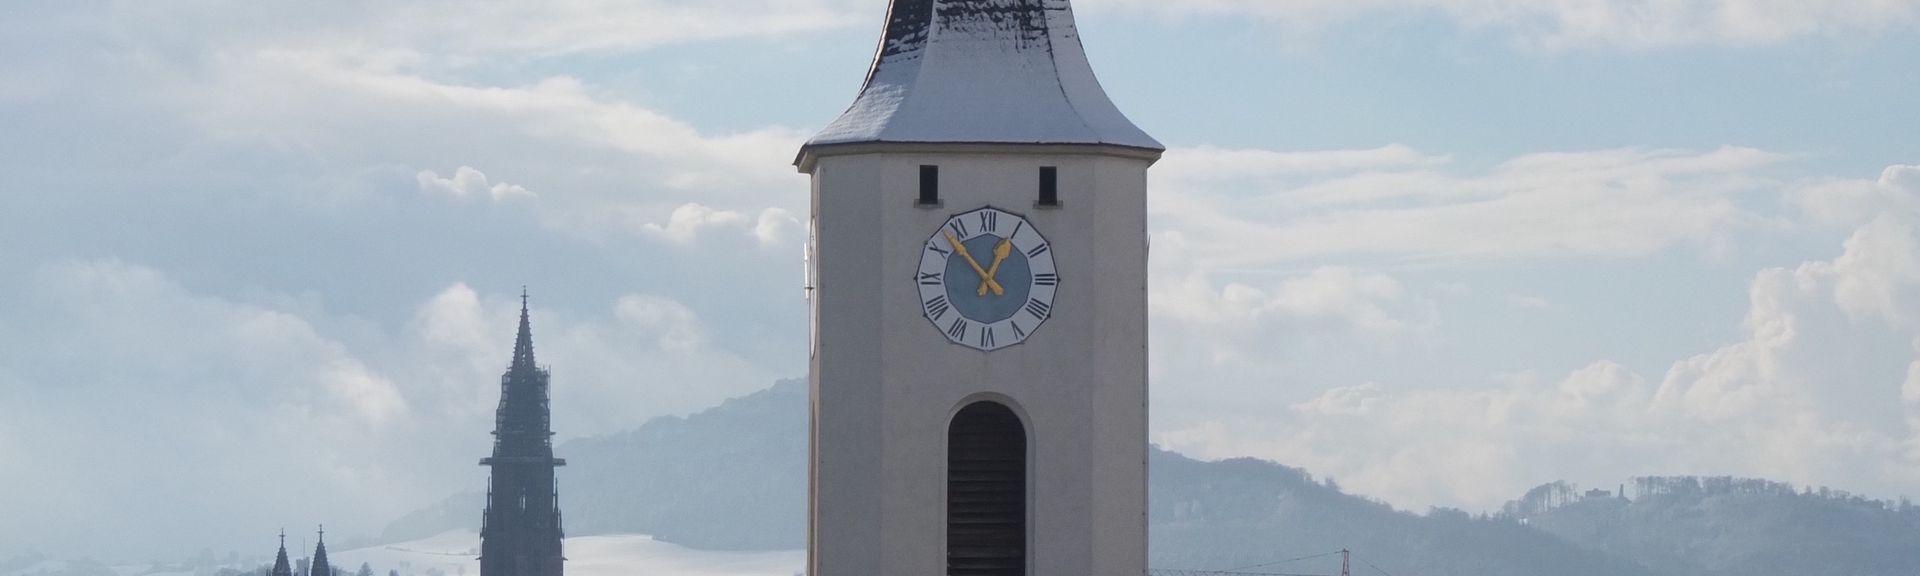 Neuburg, Fribourg-en-Brisgau, BW, Allemagne